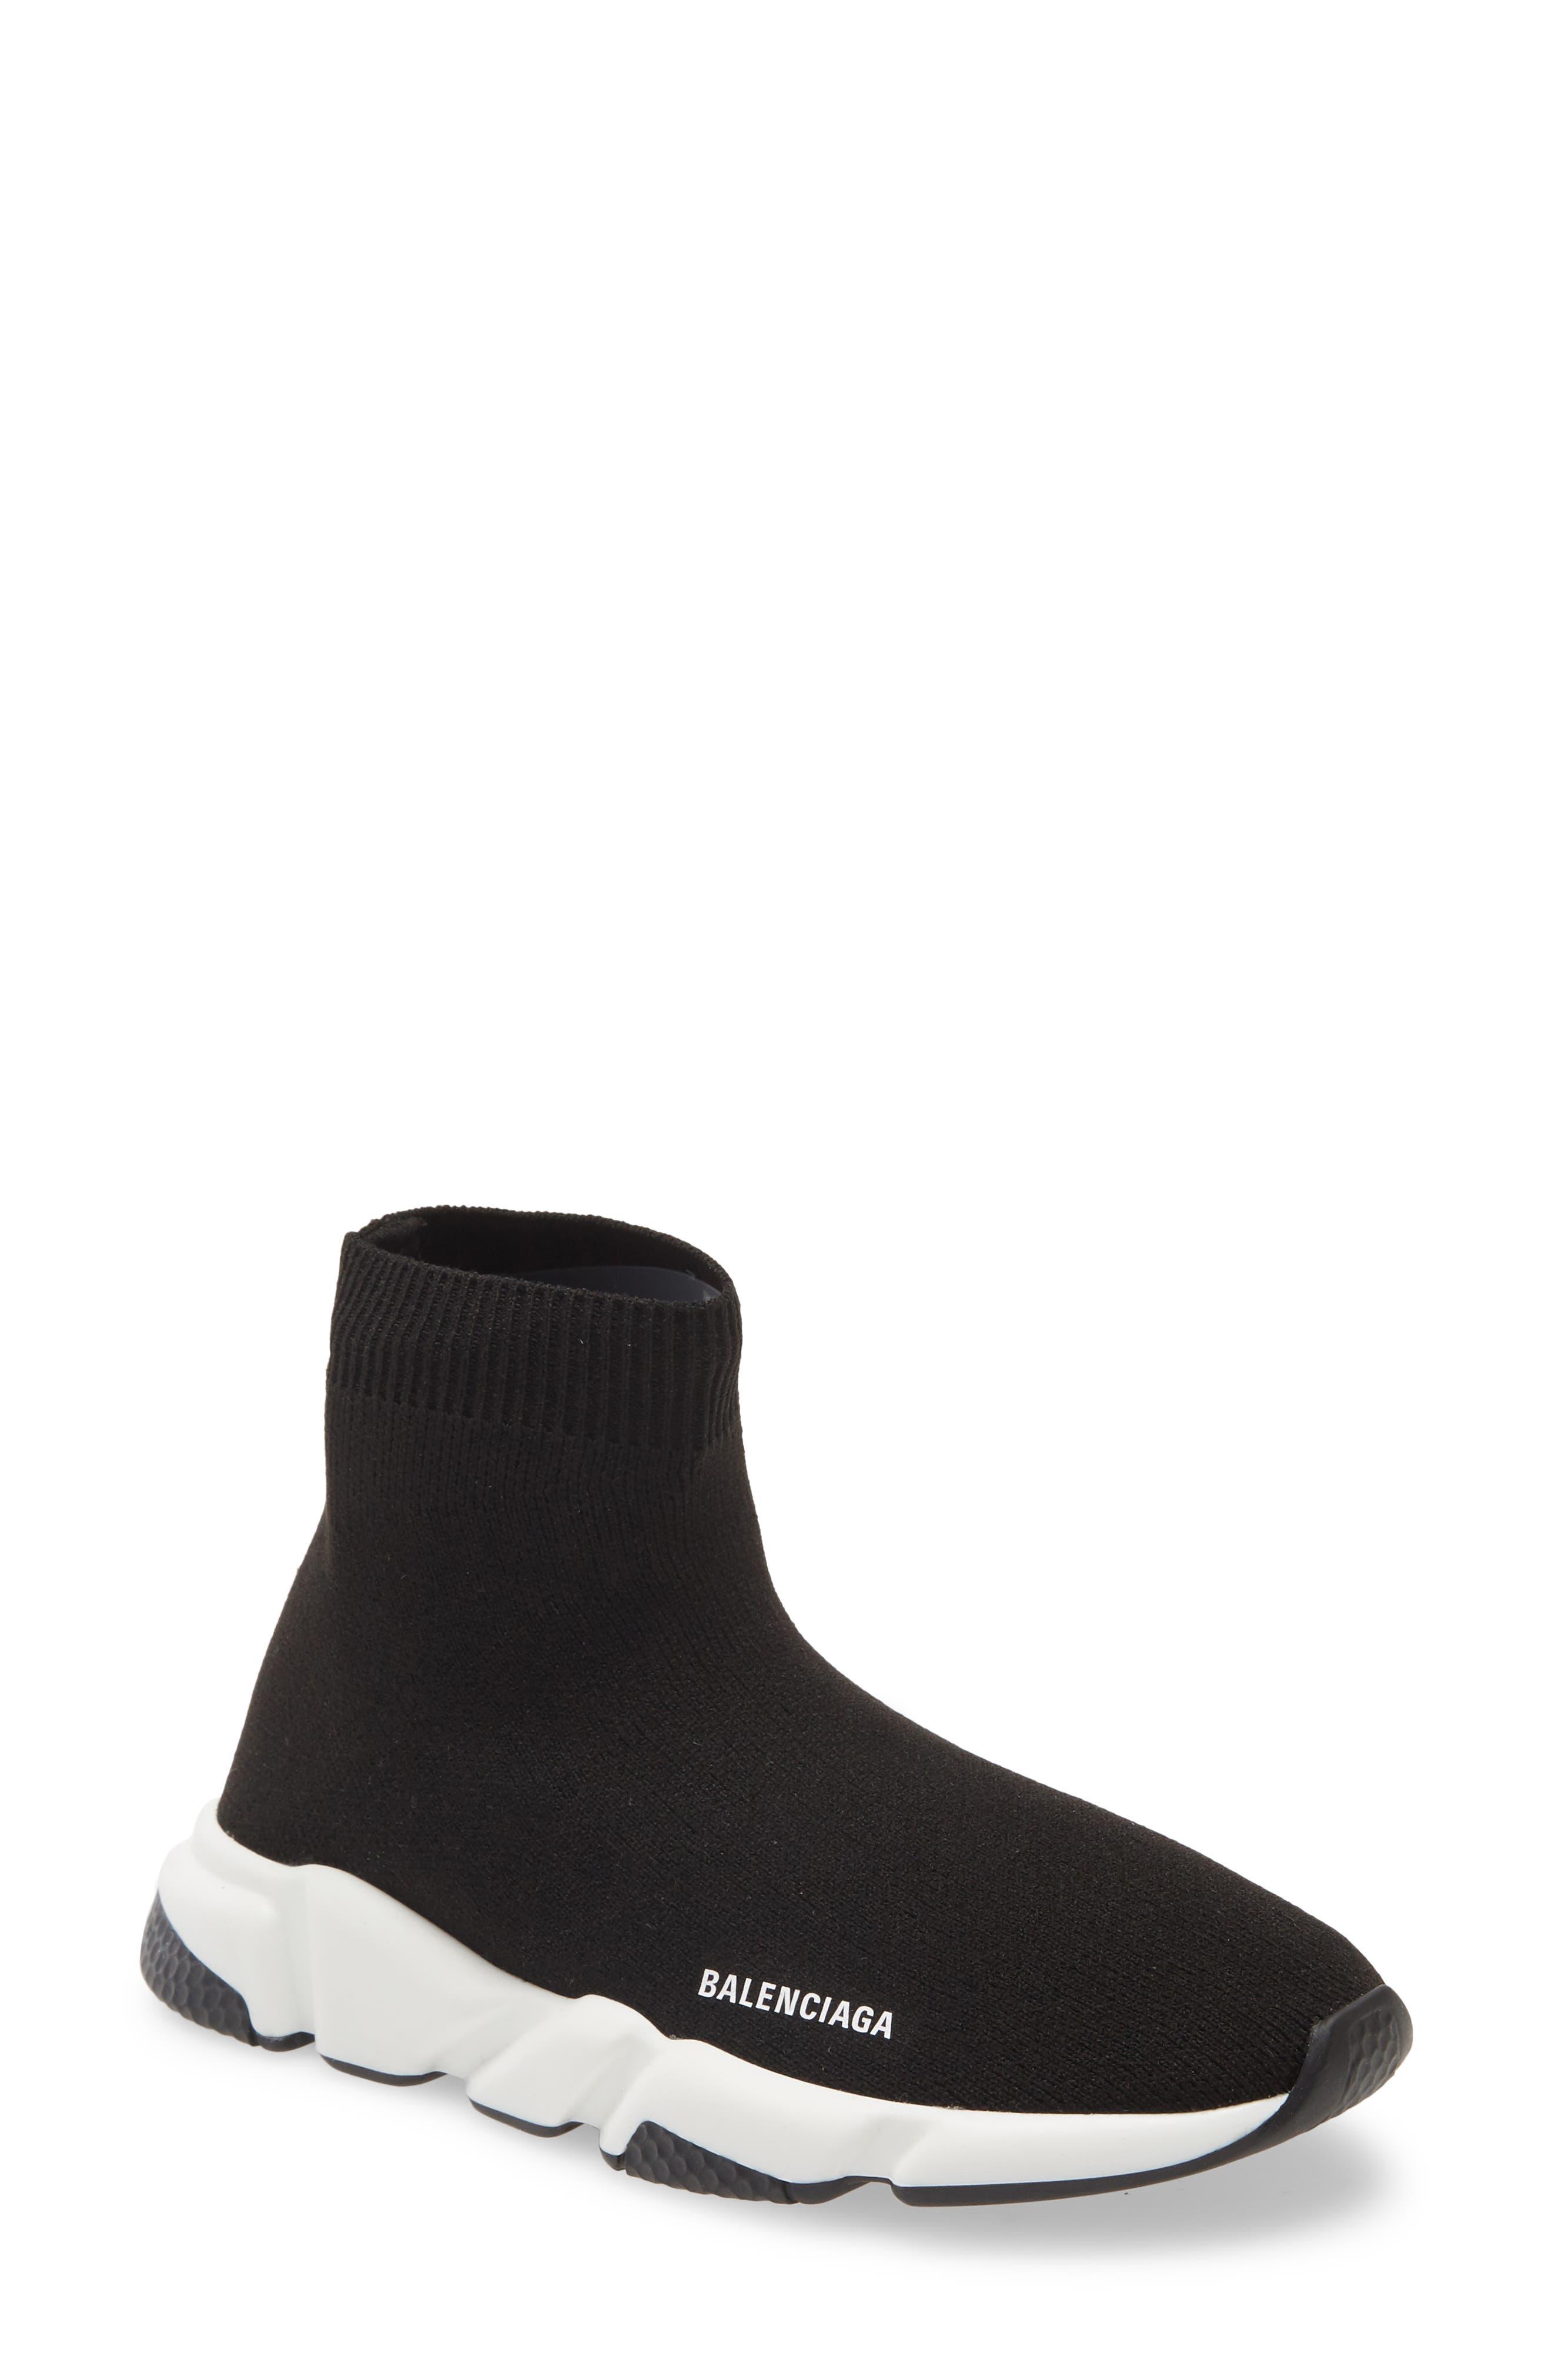 All Kids' \u0026 Baby Balenciaga Sneakers